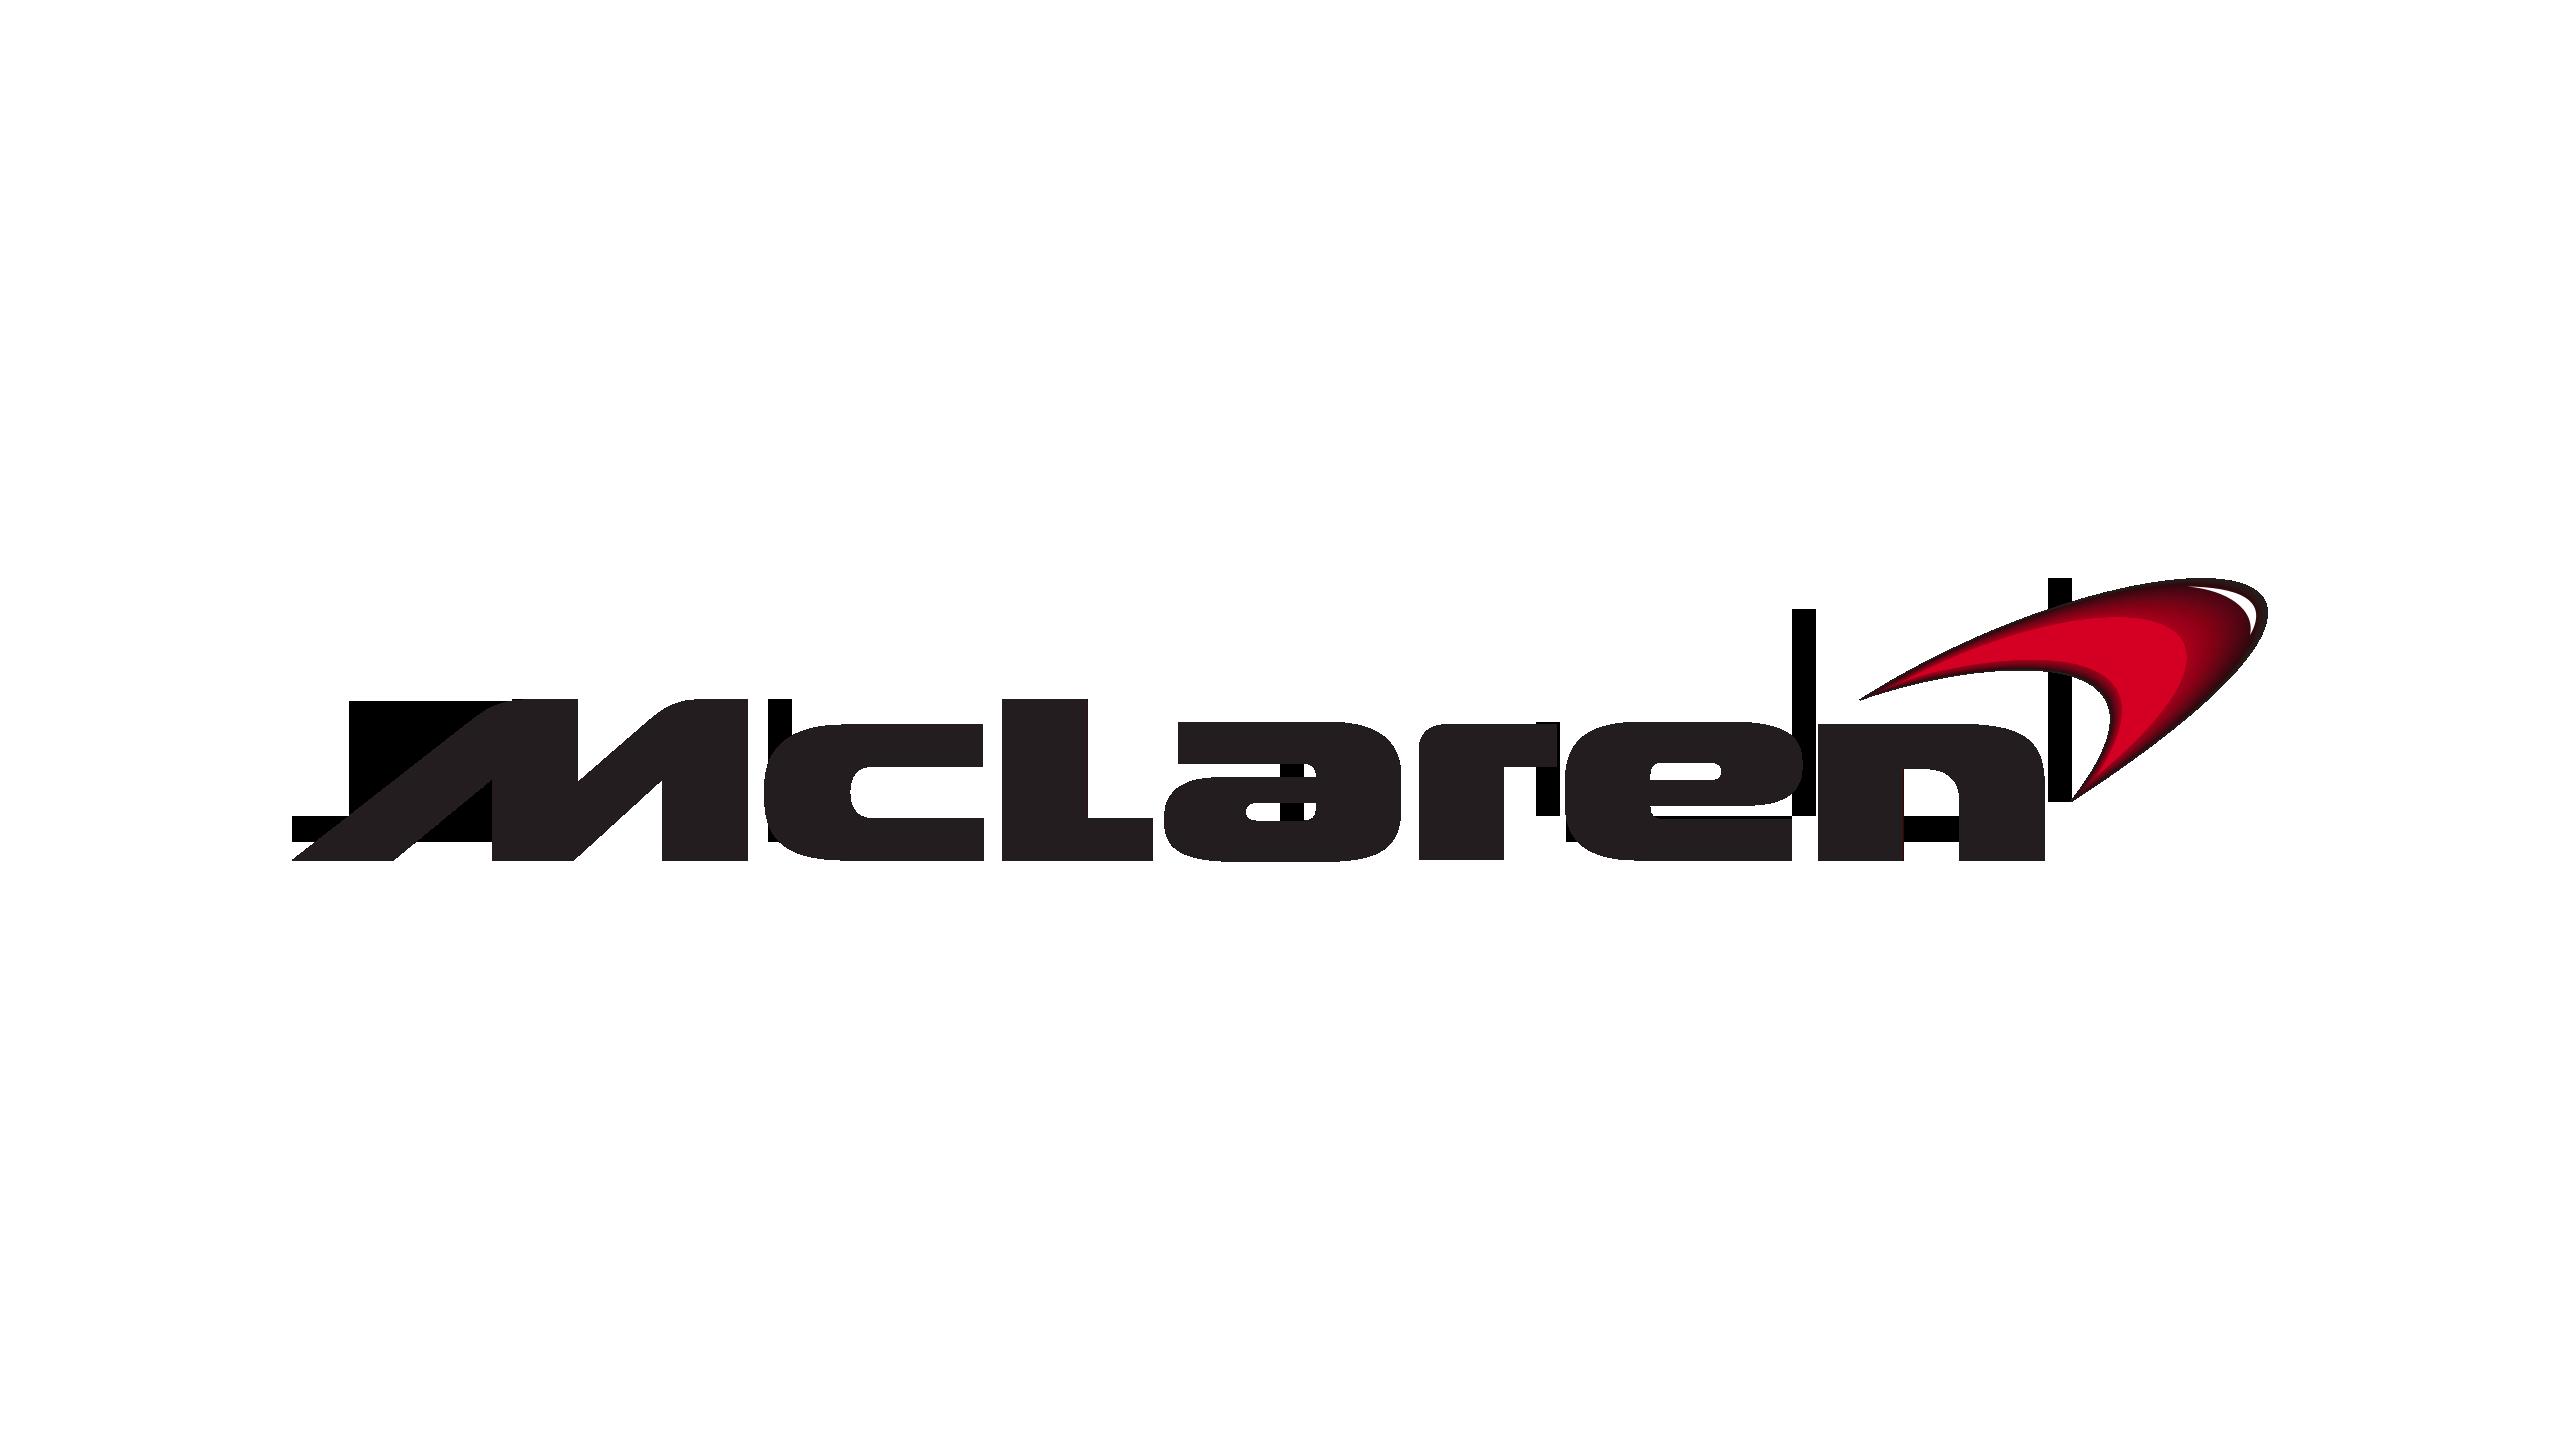 mclaren-logo-png-mclaren-logo-2002-present-2560x1440-hd-png-2560.png